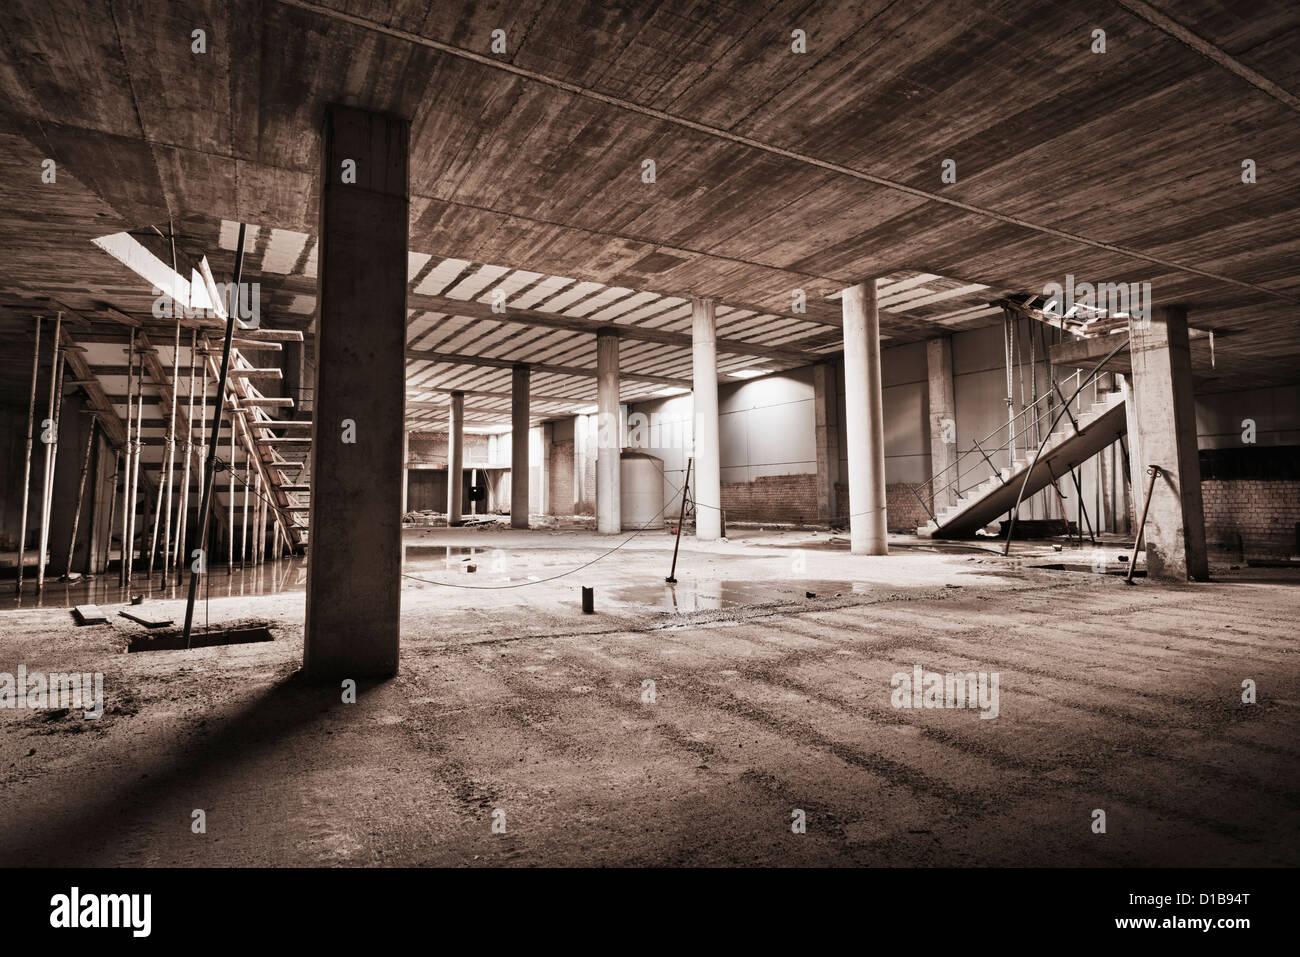 Edificio abandonado. Imagen De Stock